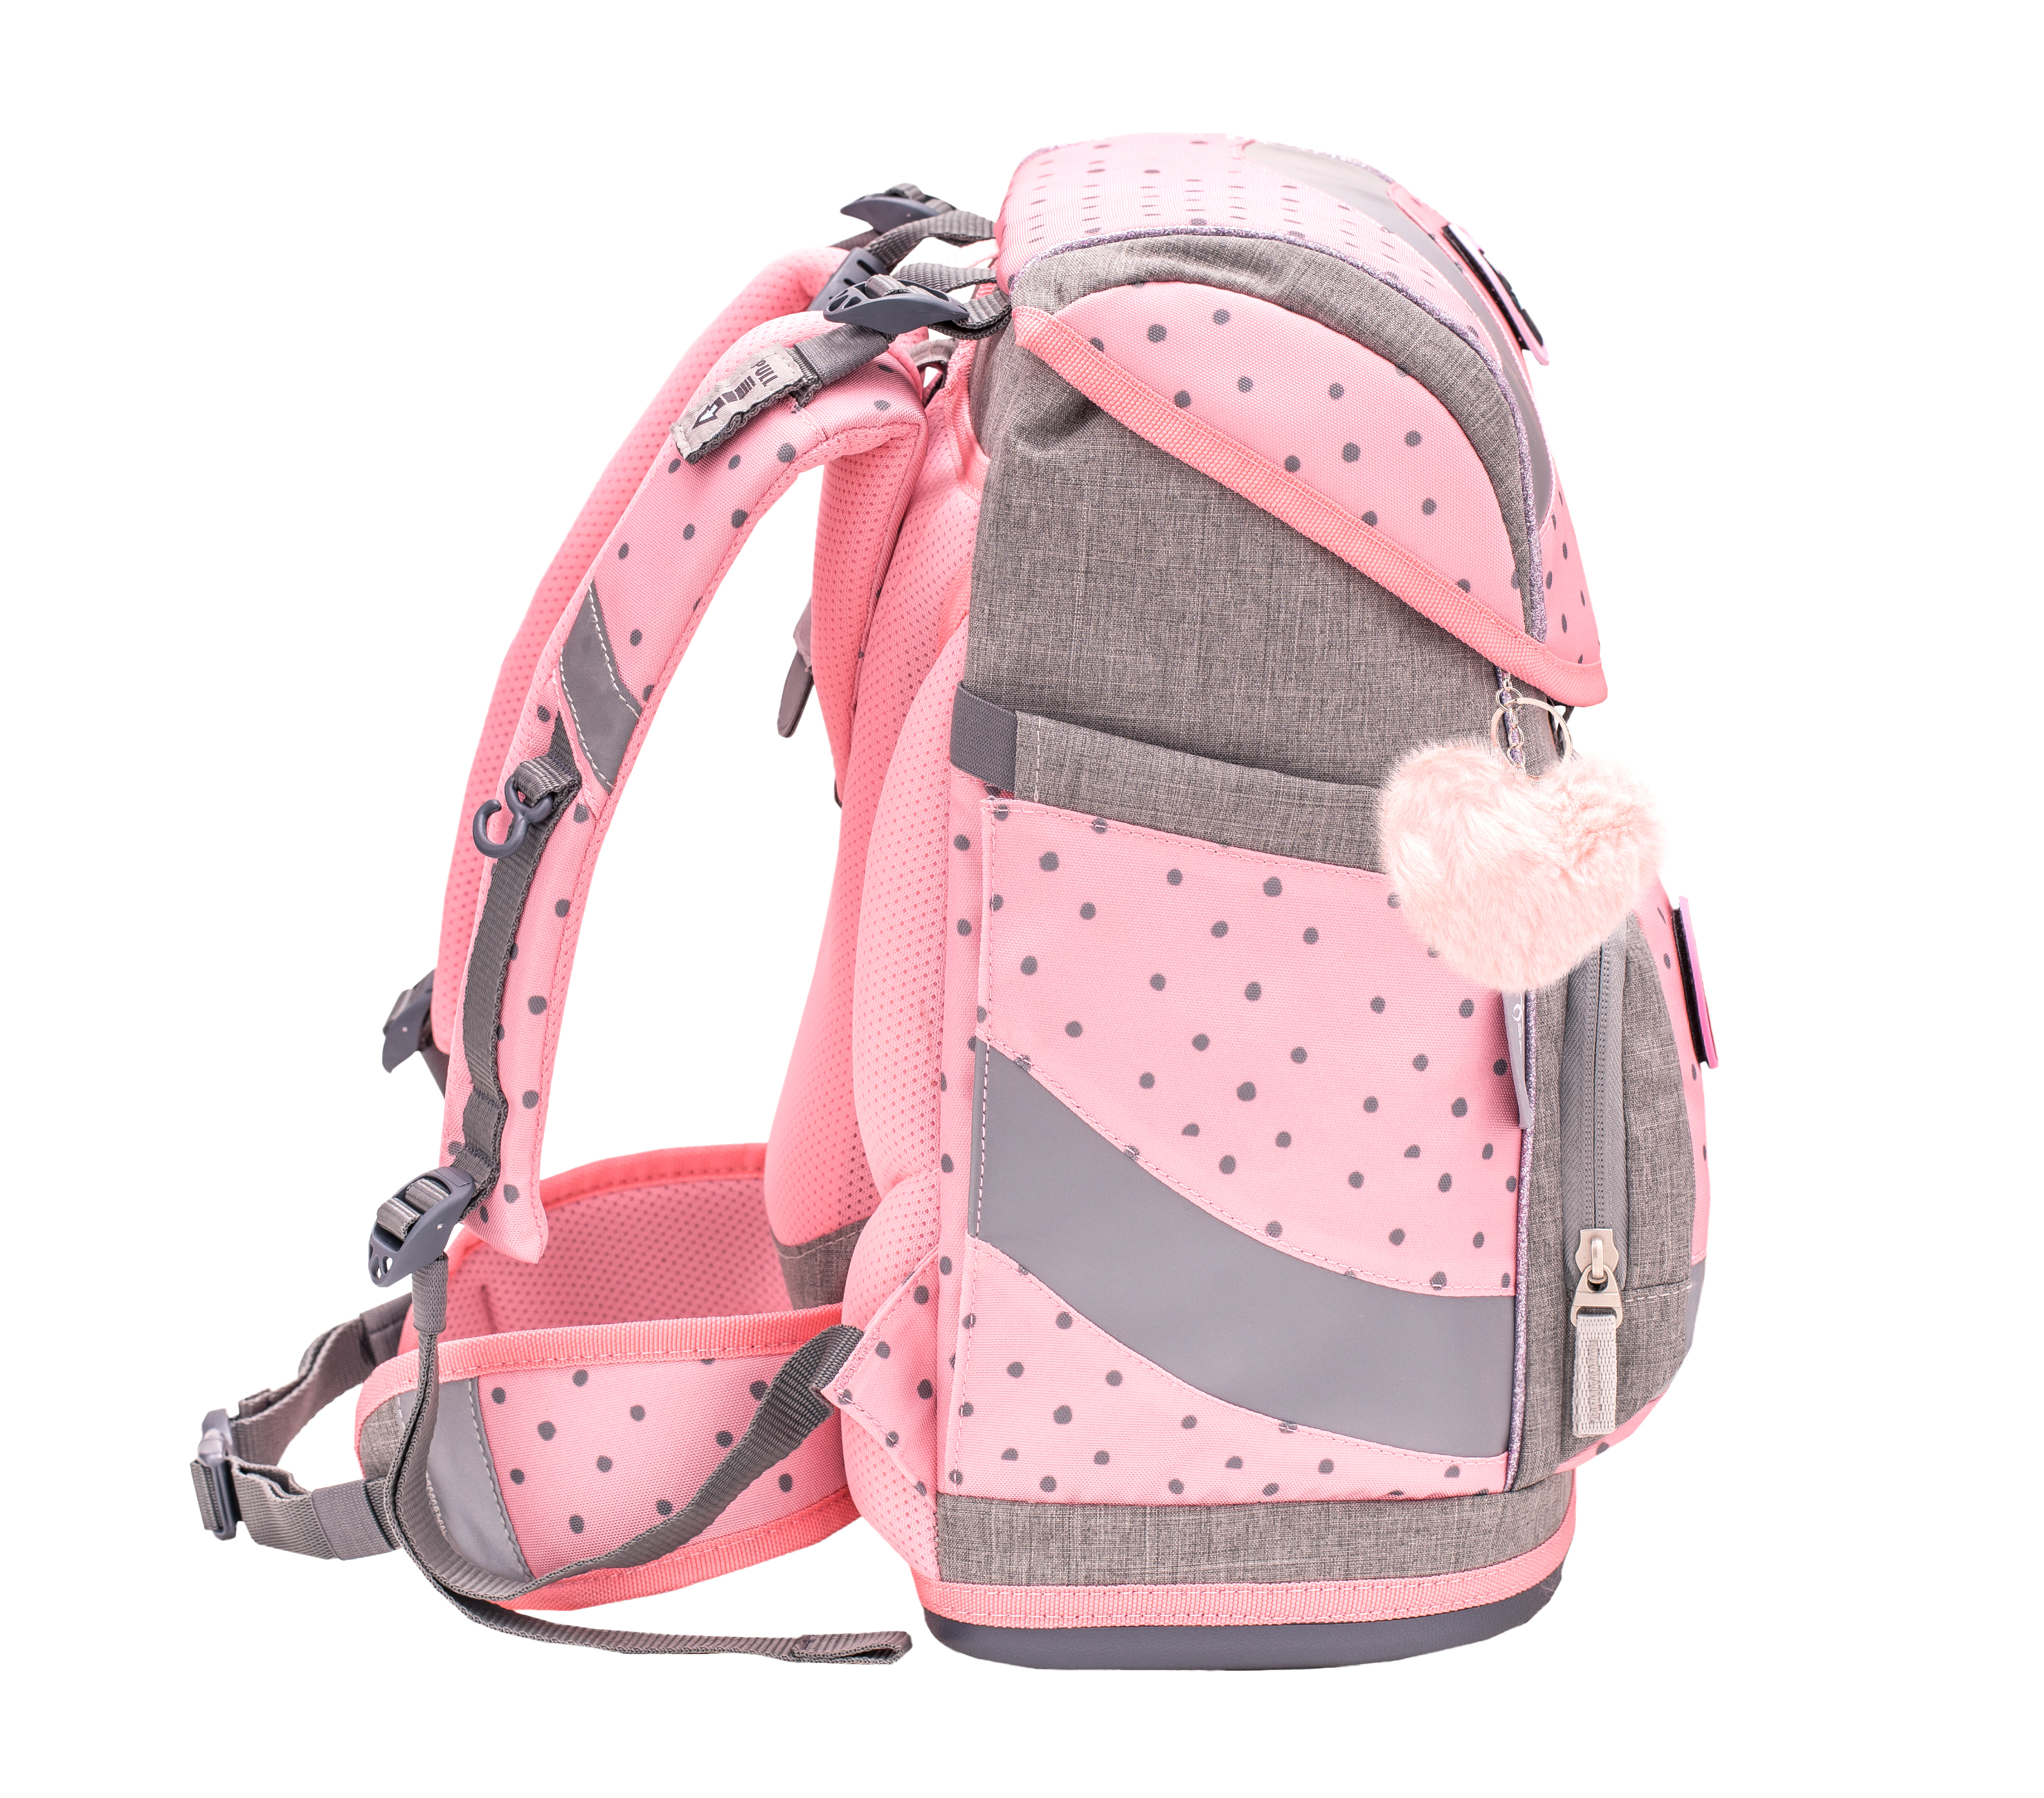 4-tlg. Schulranzenset Smarty 20 Liter - Pink Dots